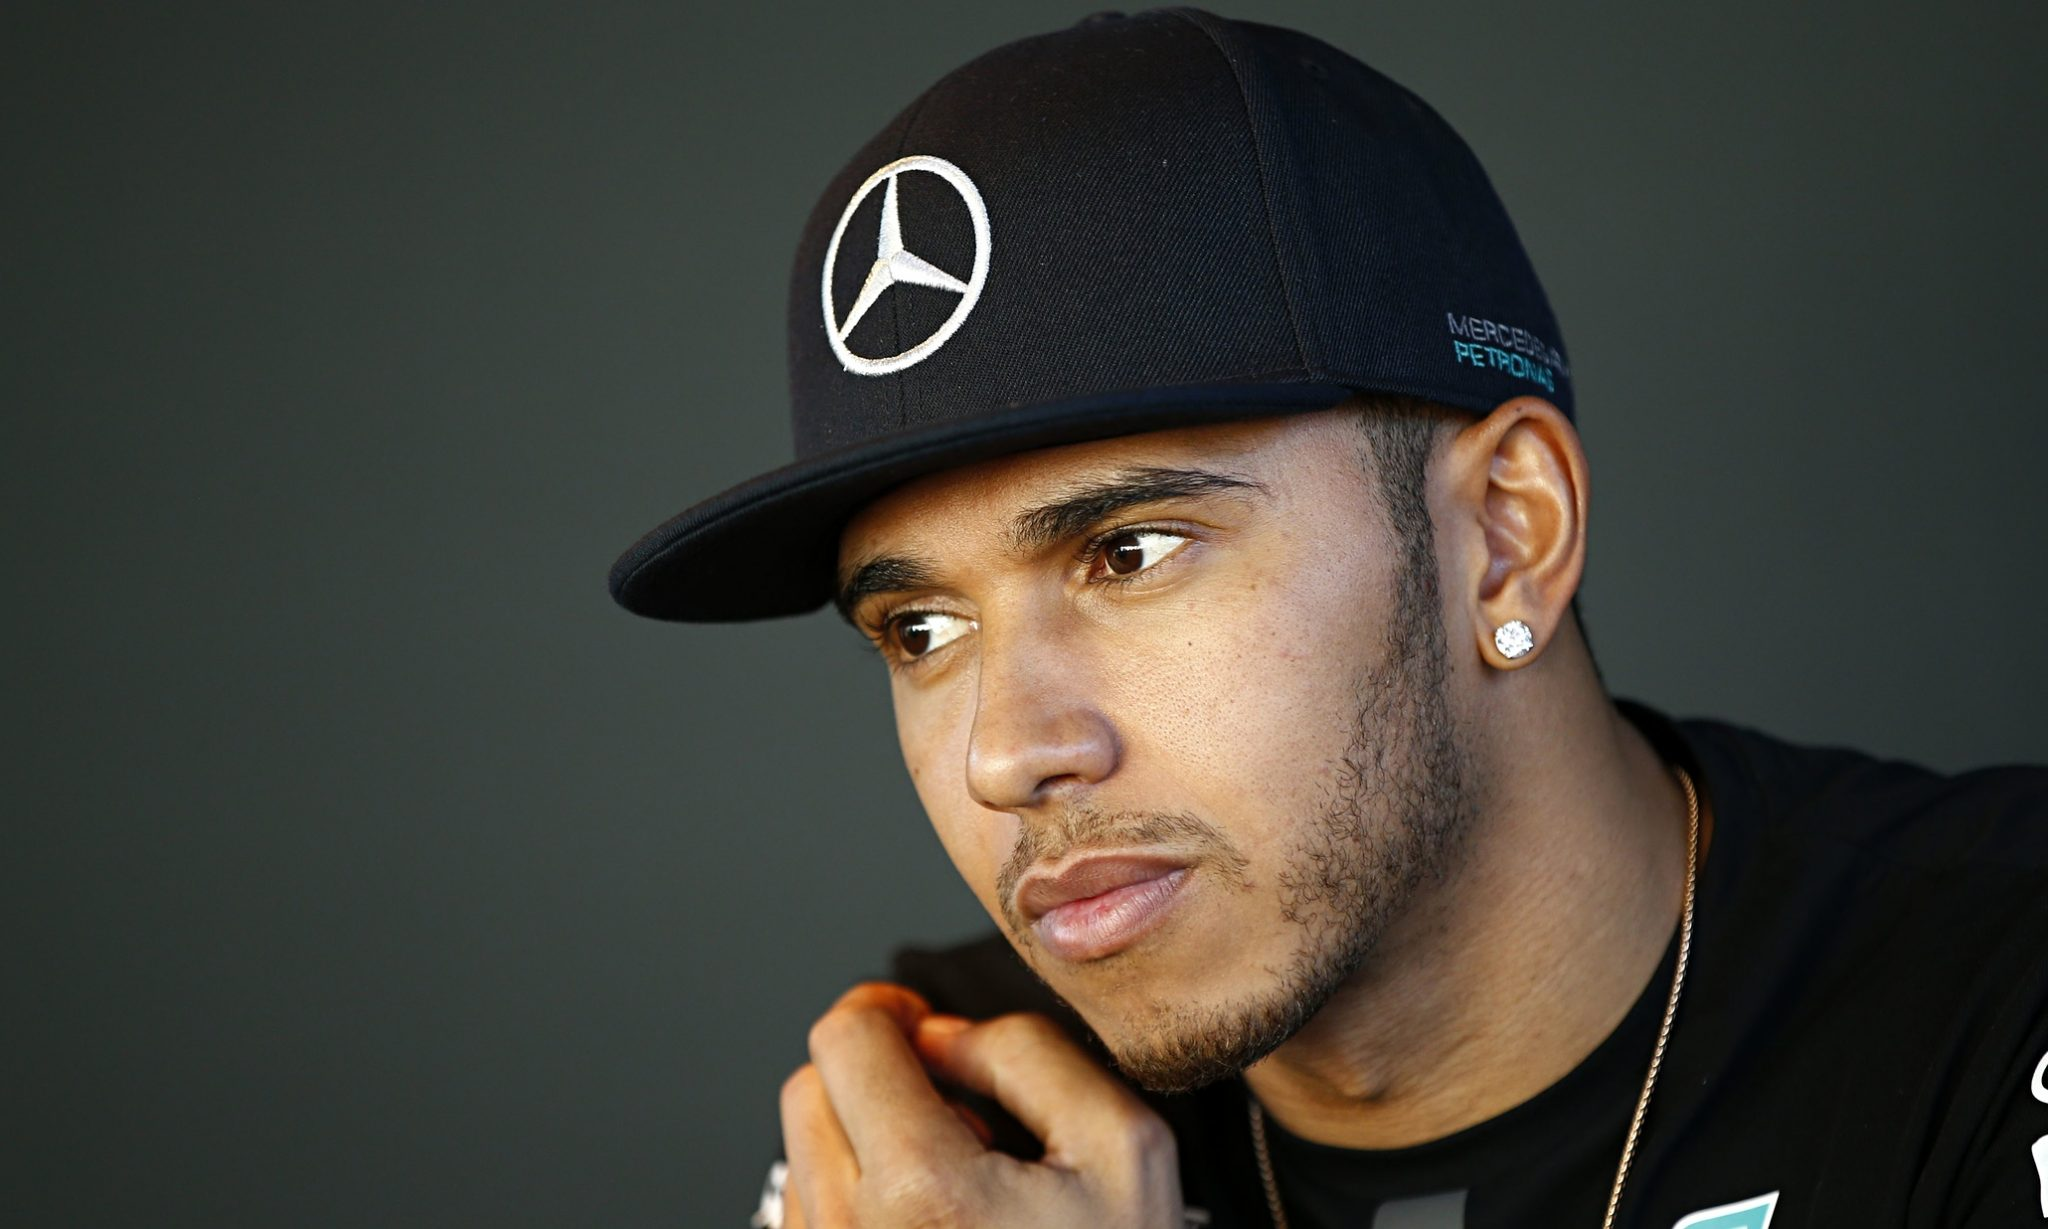 Hamilton wins again